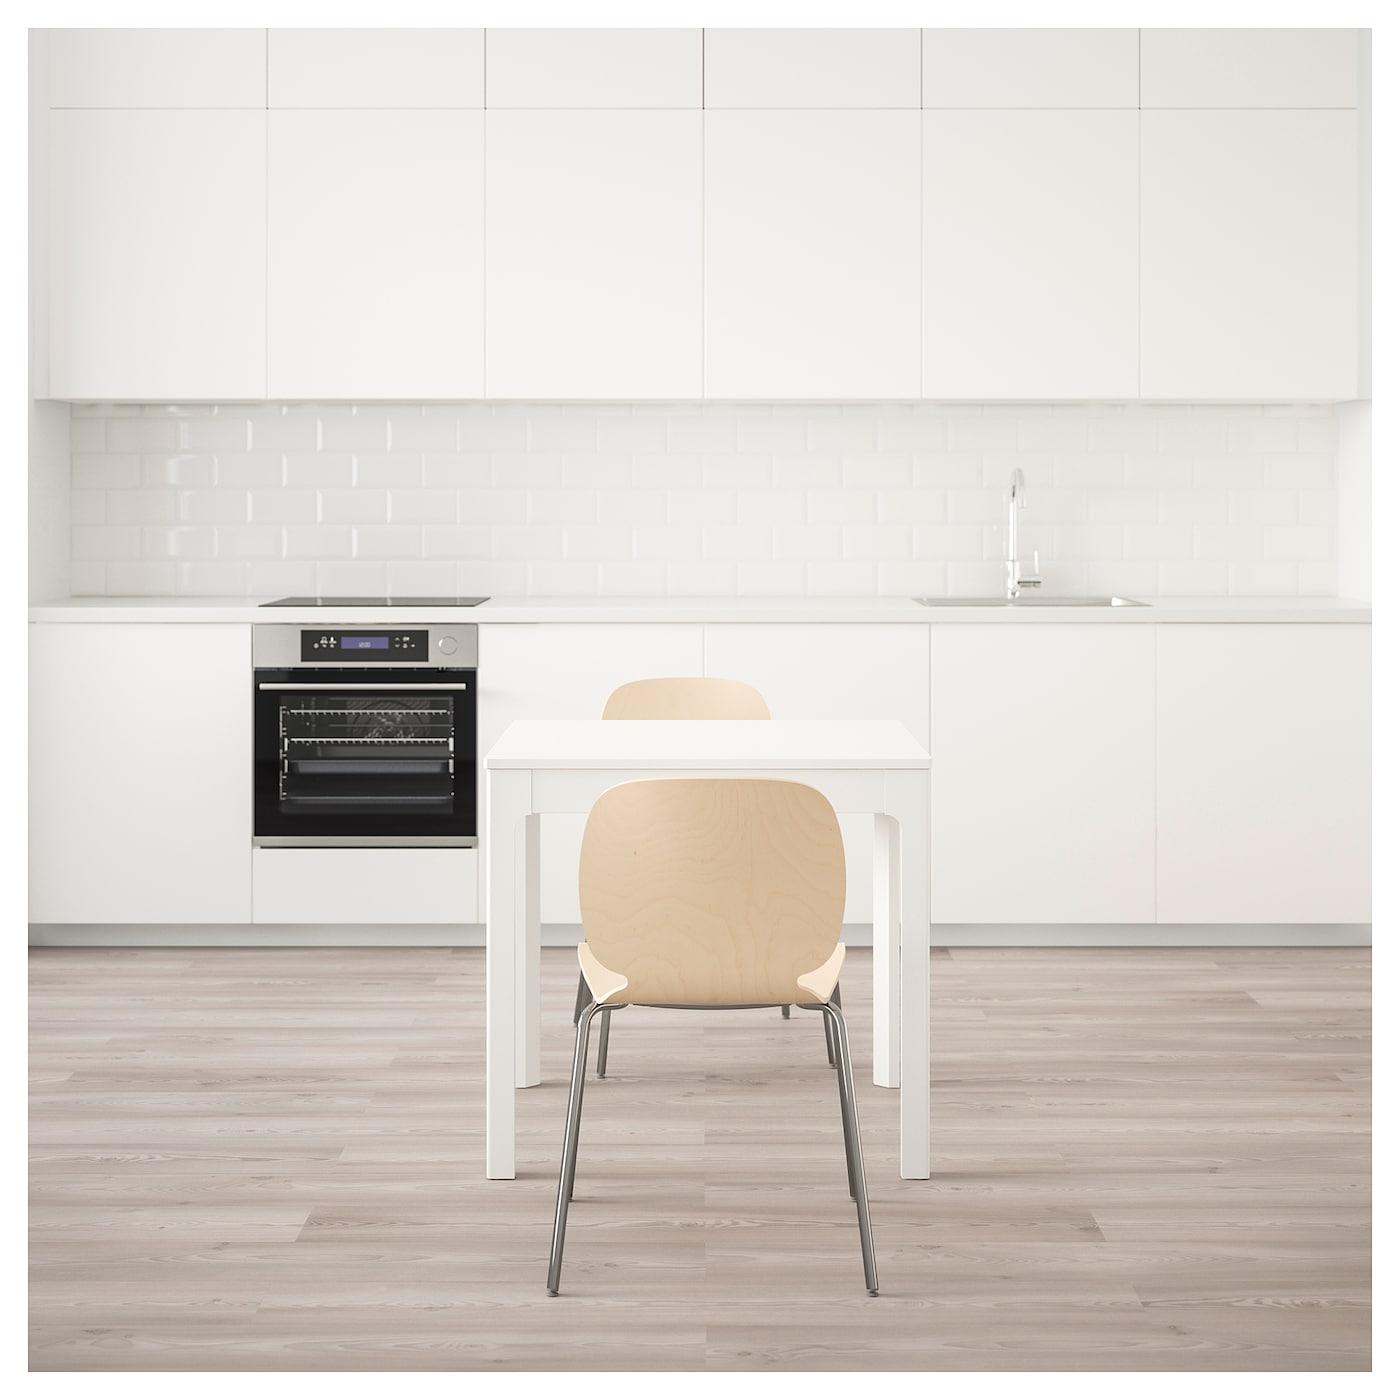 Svenbertil ekedalen mesa y dos sillas blanco abedul 80 120 cm ikea - Silla ekedalen ikea ...